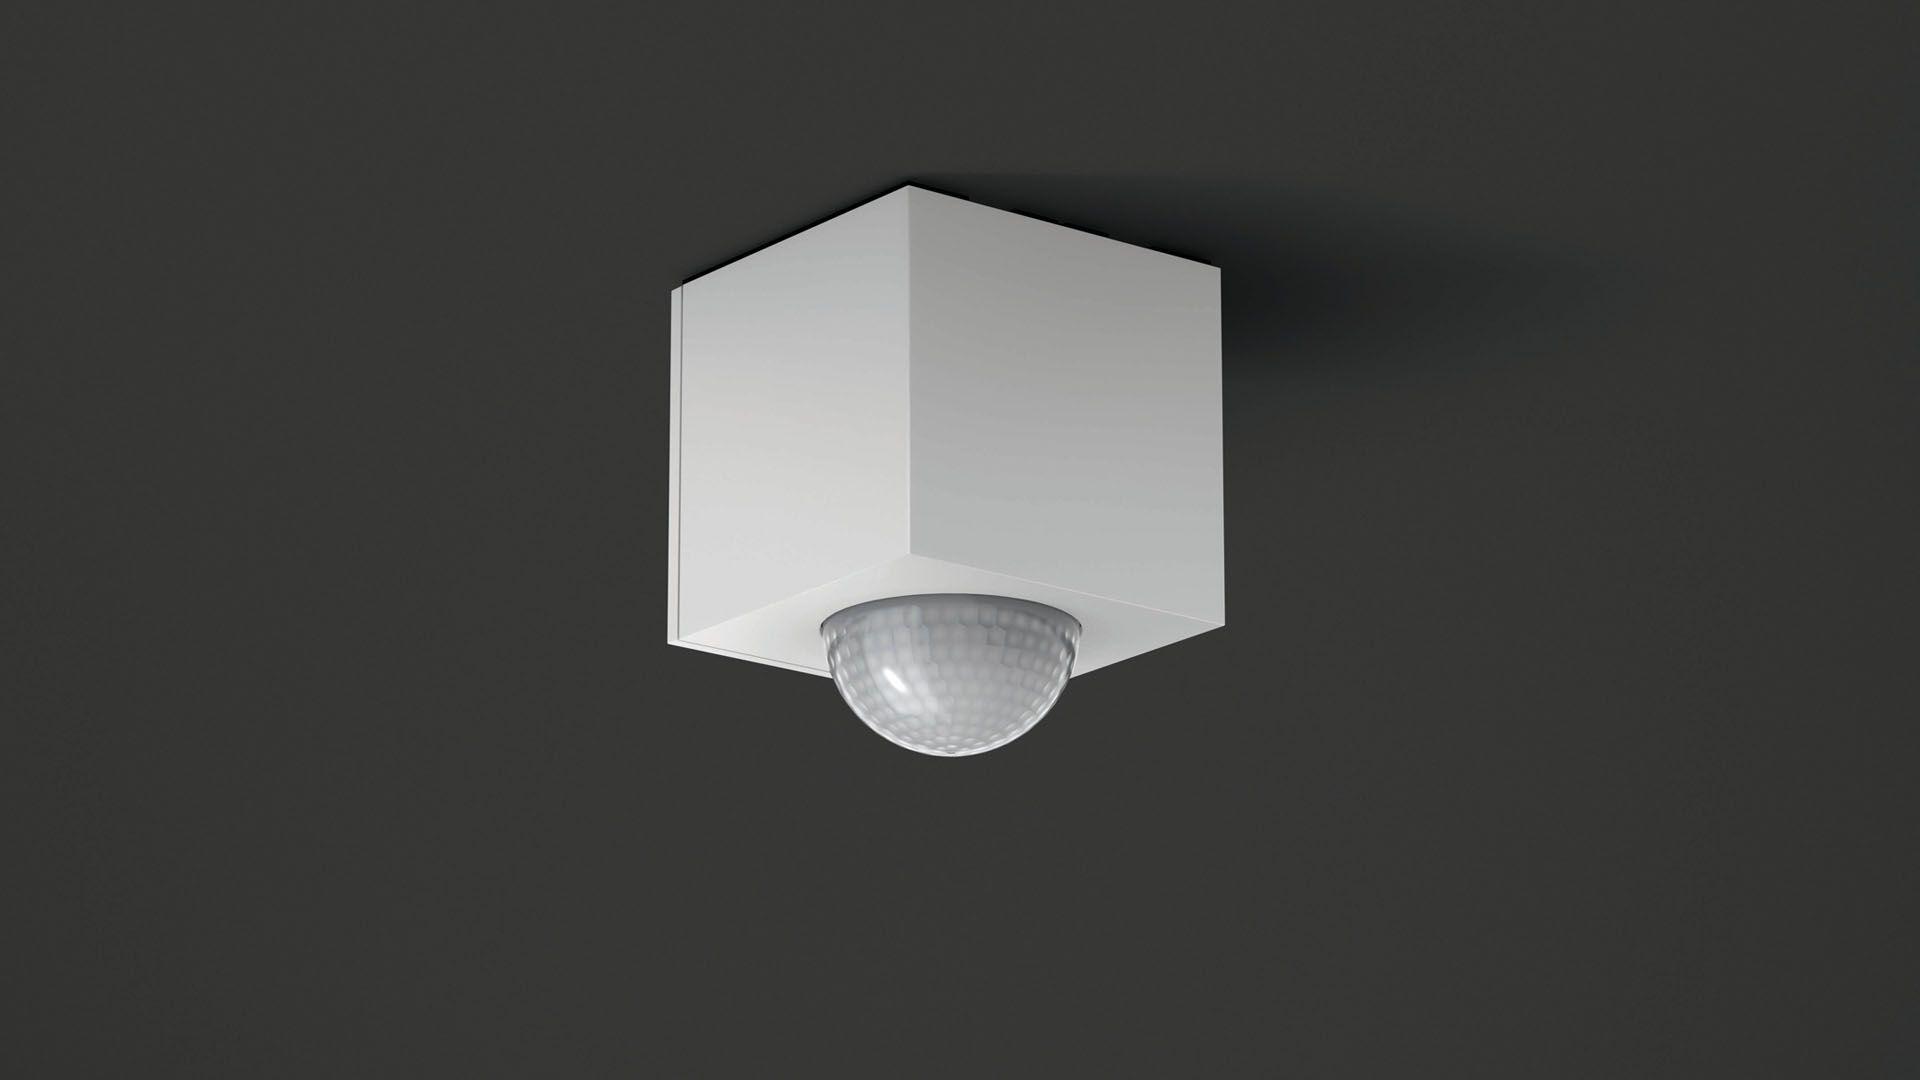 Gira Bewegungsmelder Cube Reinweiß glänzend